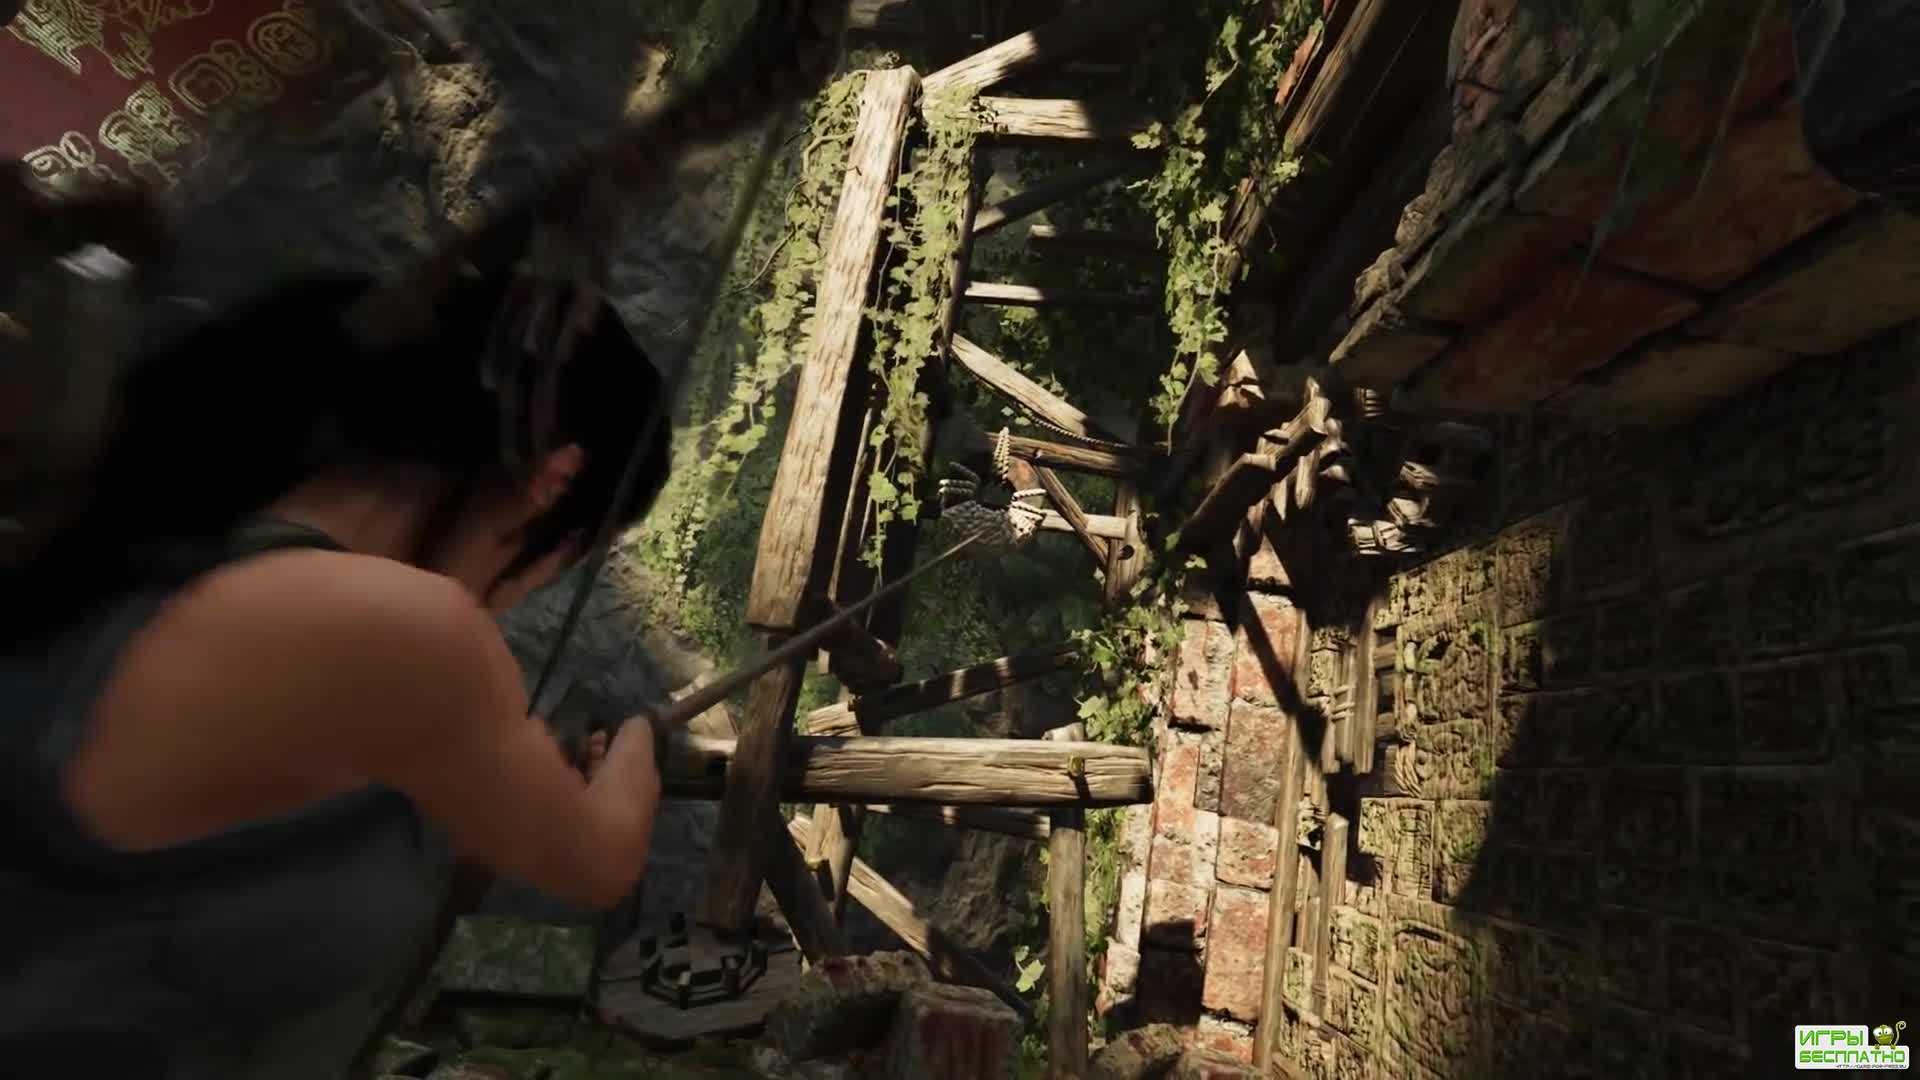 Shadow of the Tomb Raider - еще одно геймплейное видео PC-версии с трассиро ...